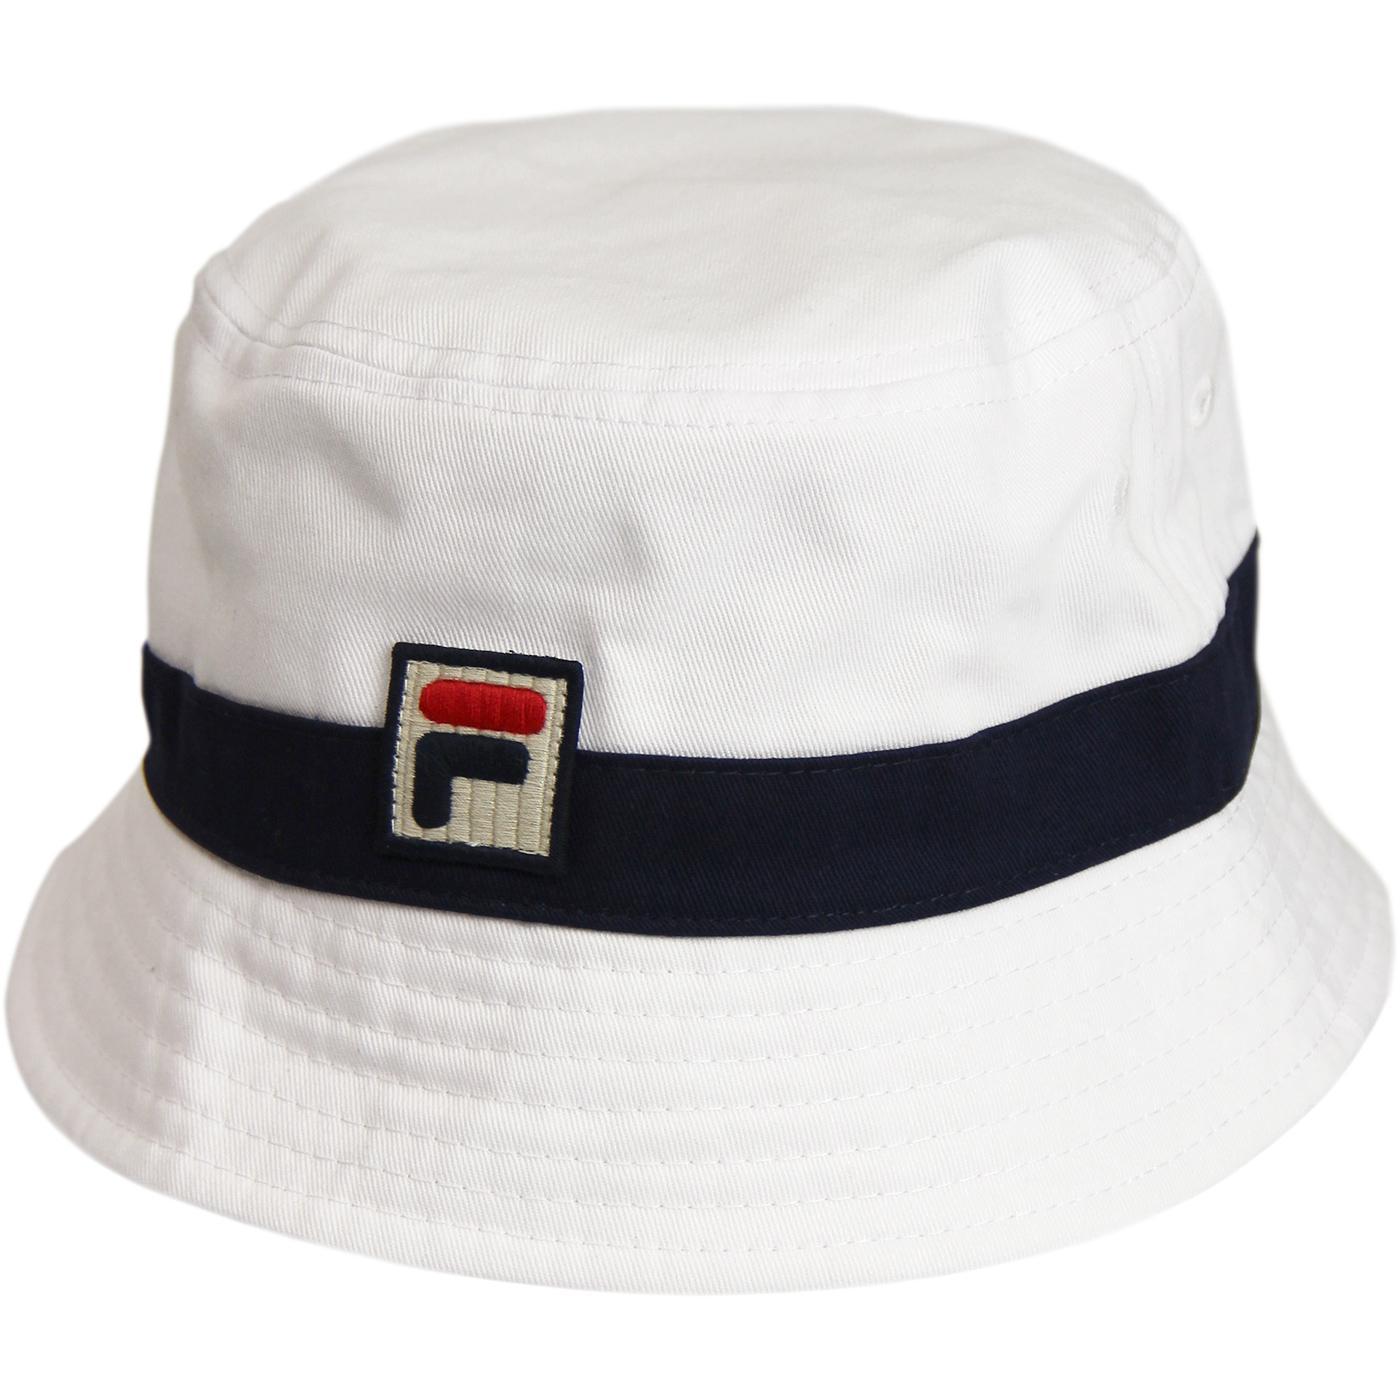 Basil FILA VINTAGE Retro 1990s Bucket Hat (W/P)